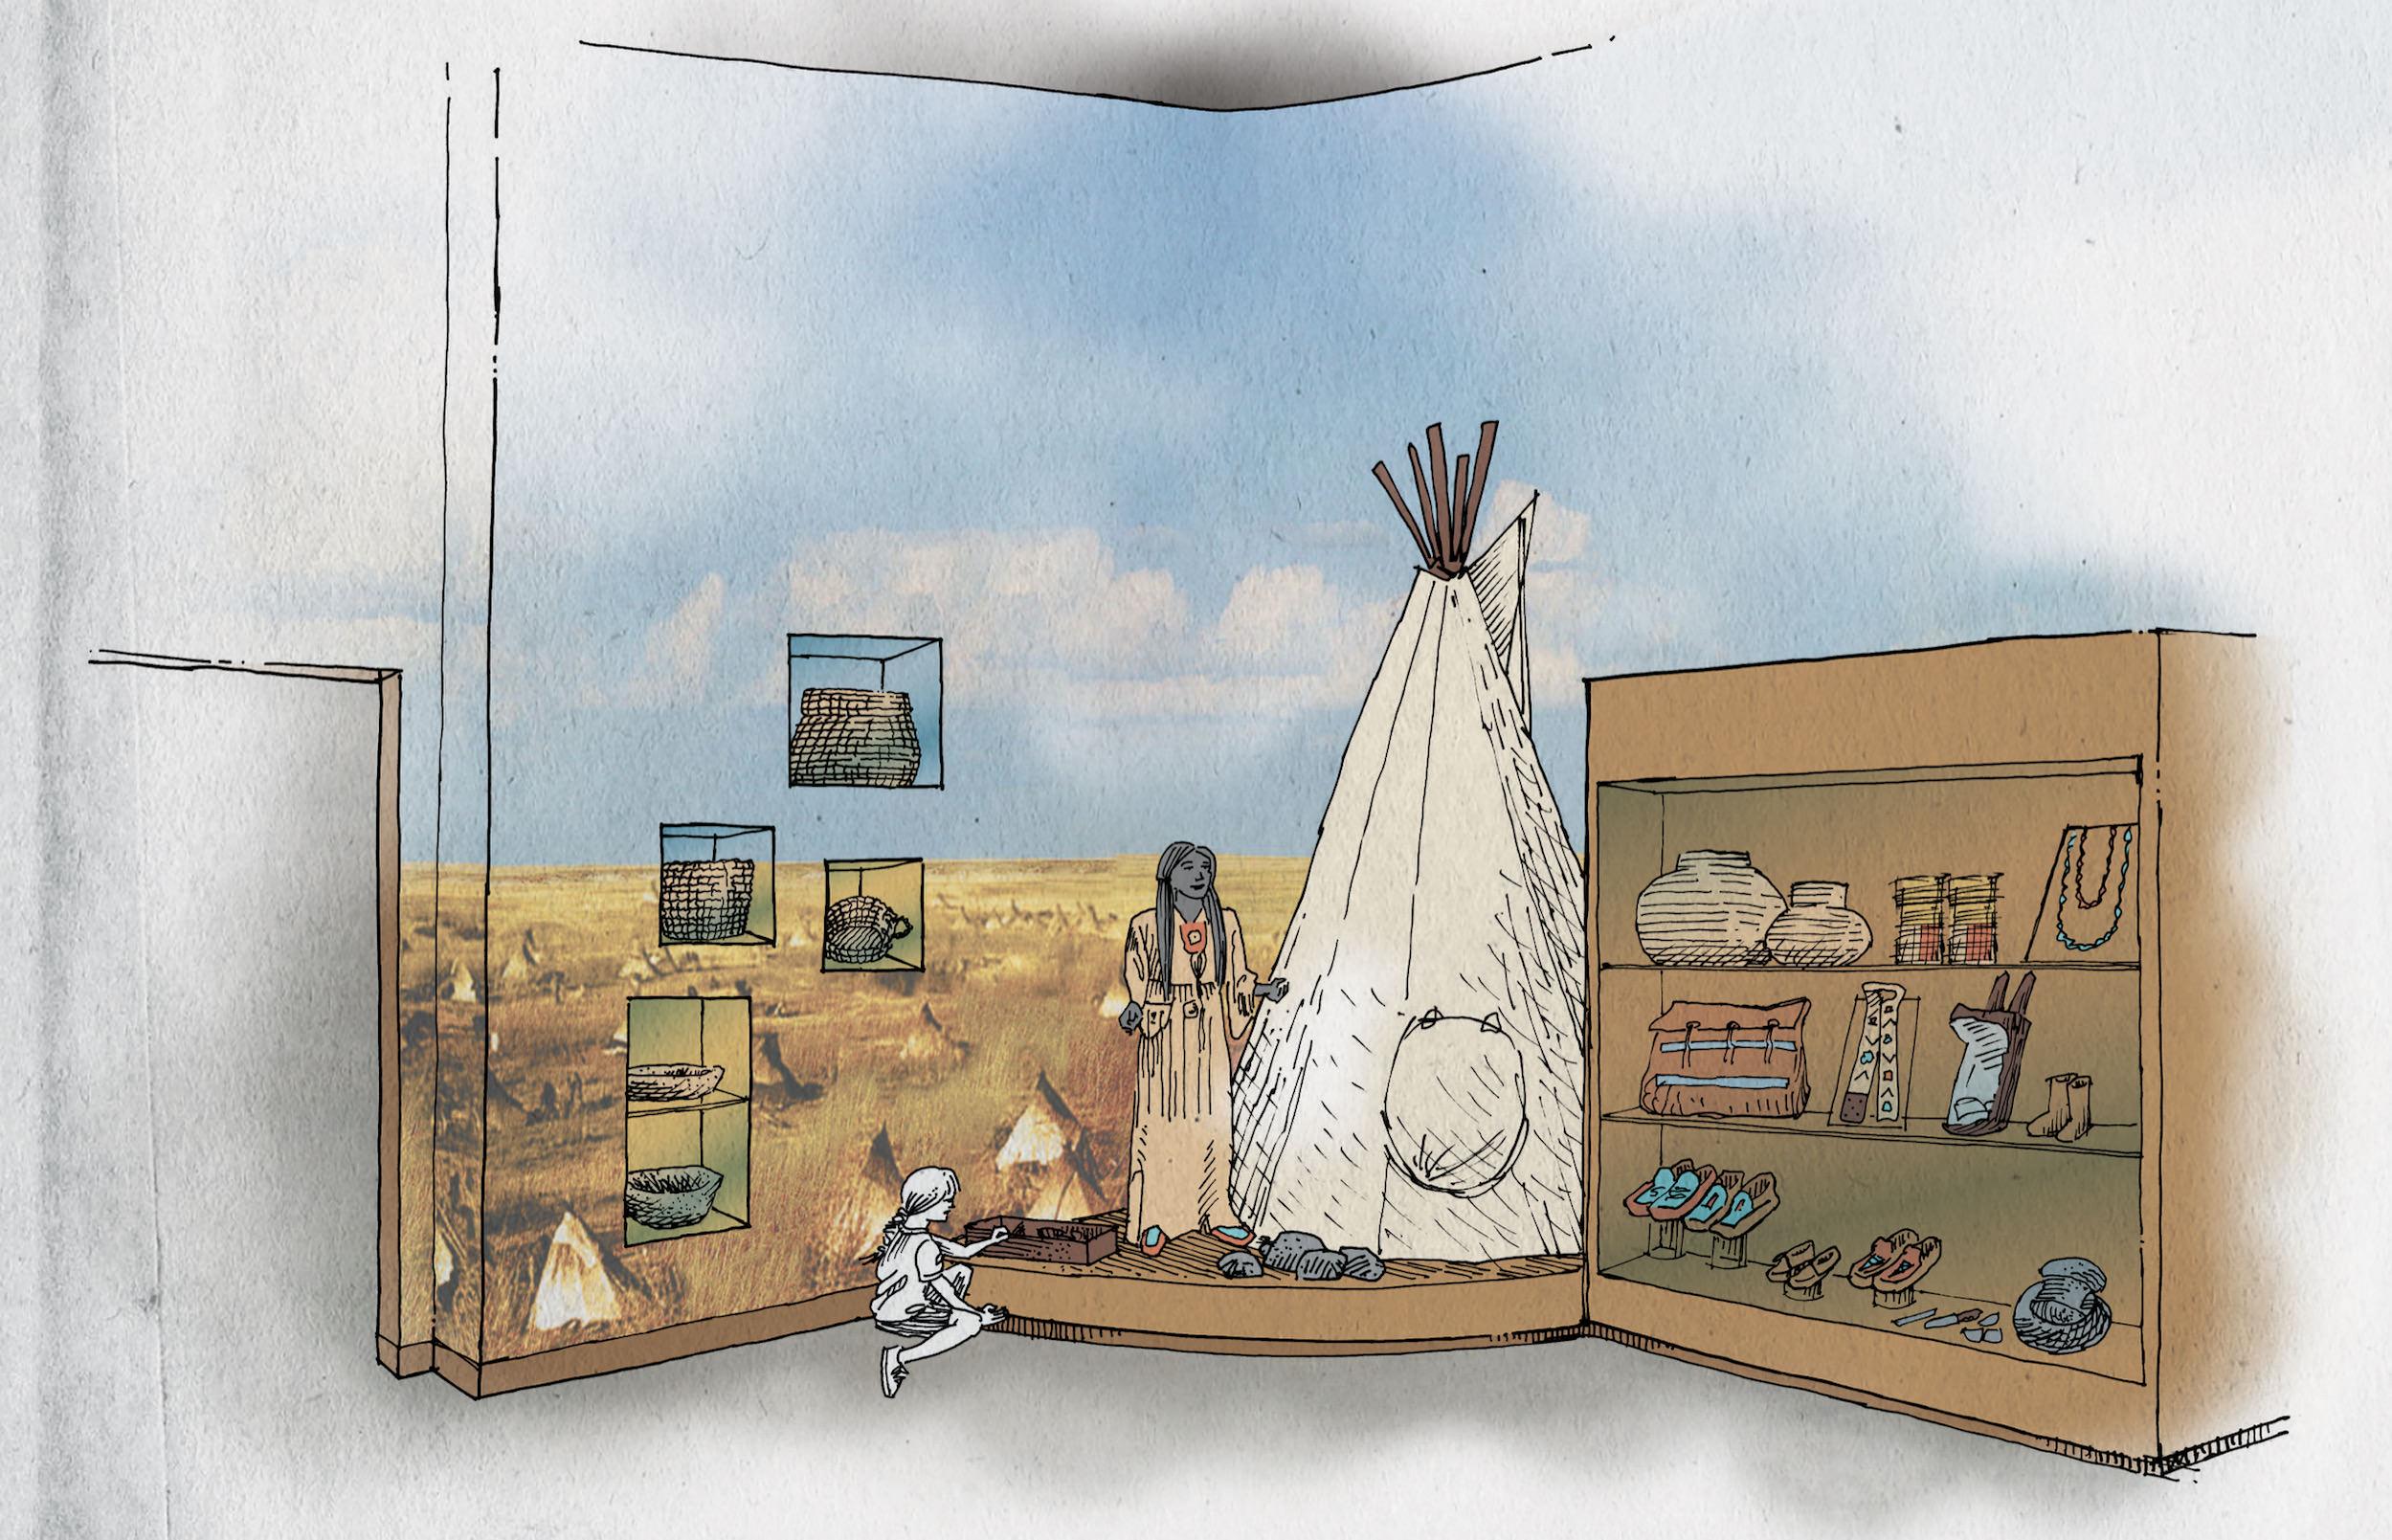 1-0 Native Americans 2_181010.jpg